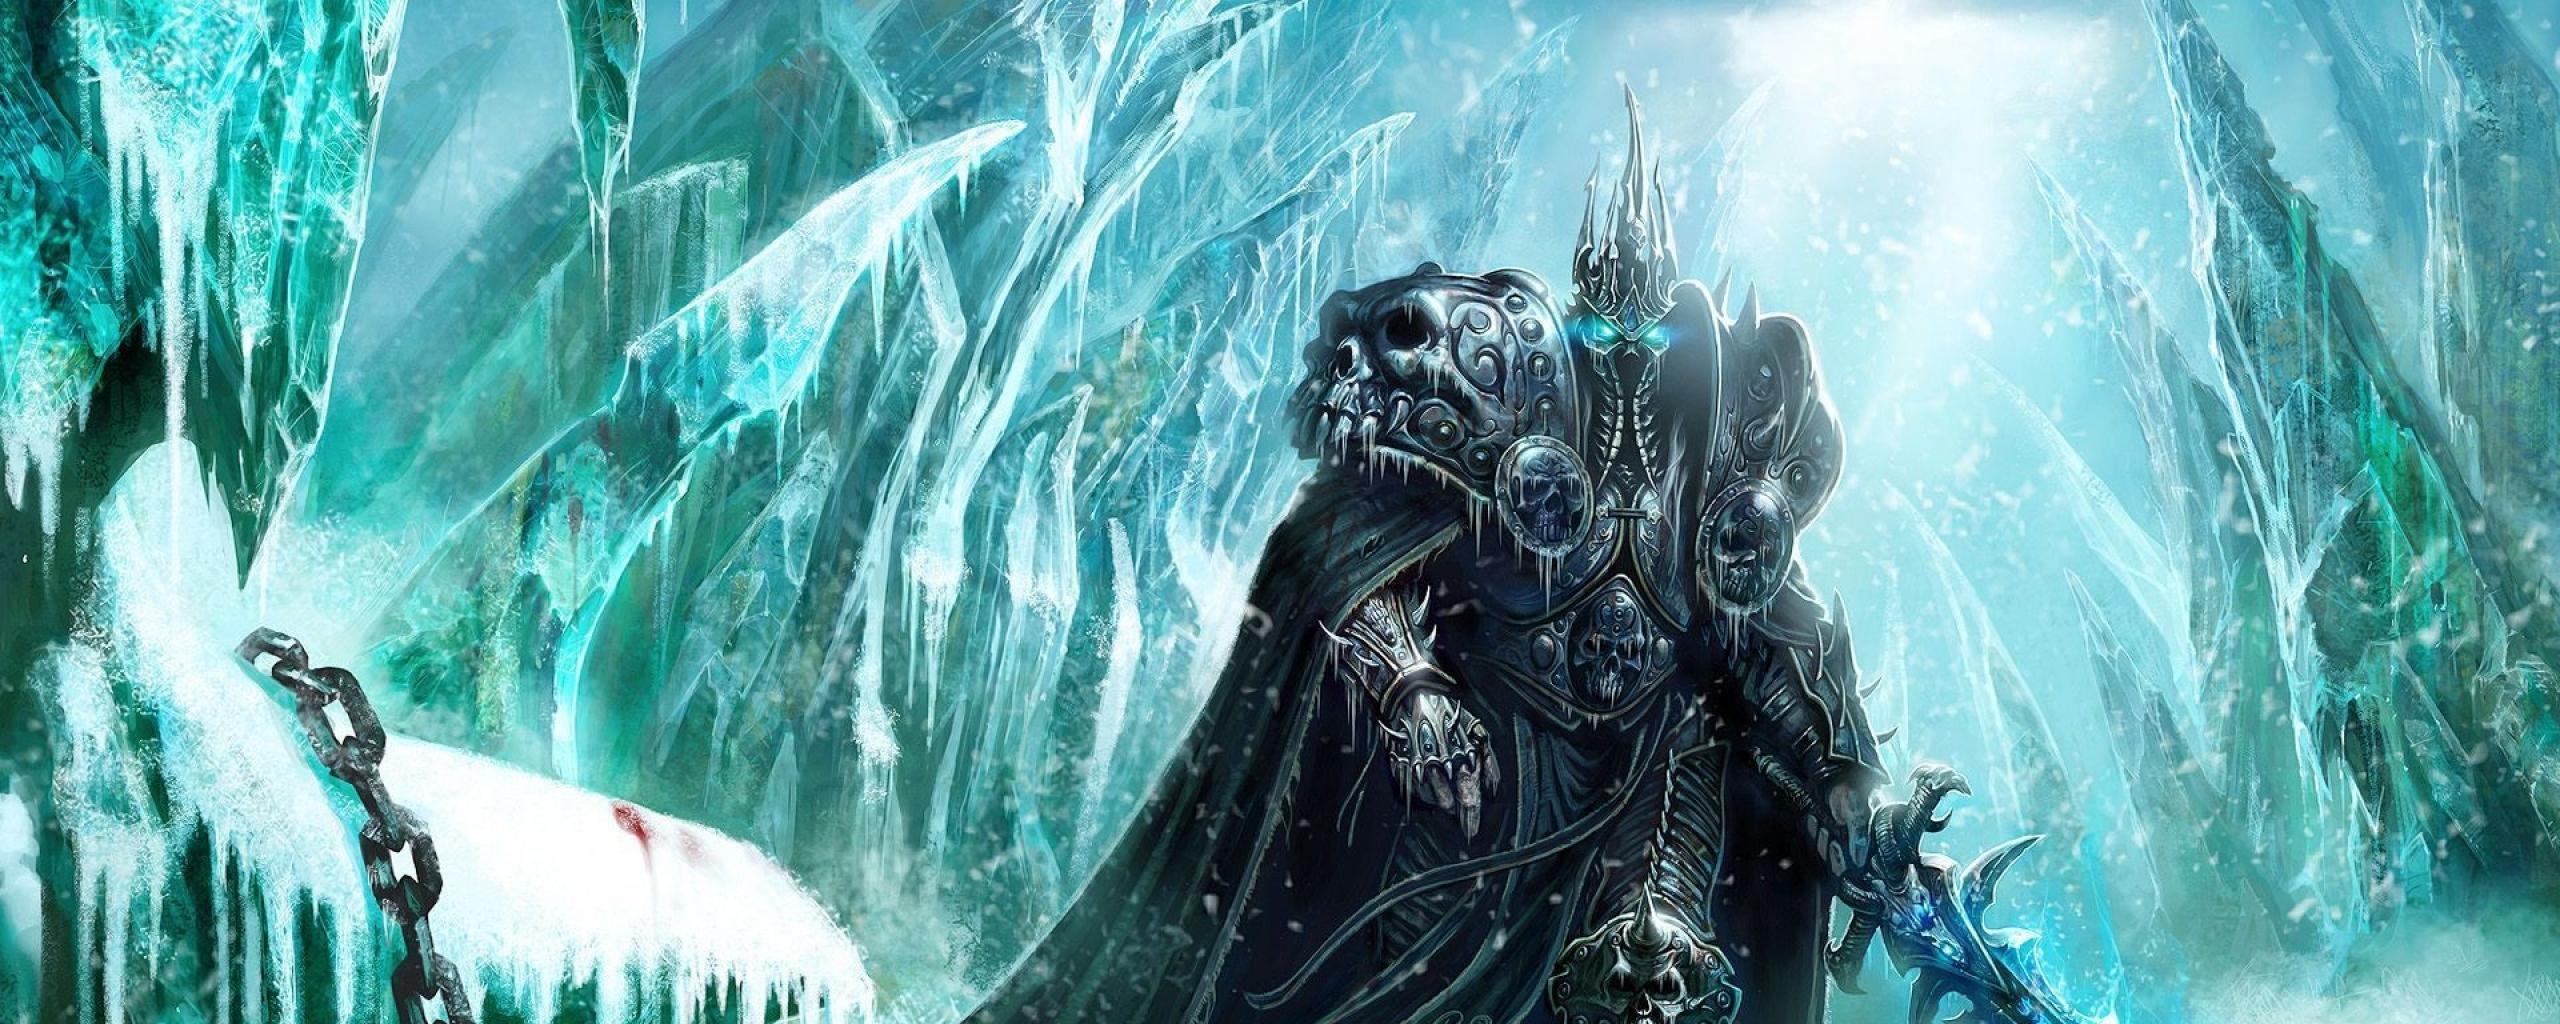 Download Wallpaper 2560x1024 World of warcraft, Lich king, Sword